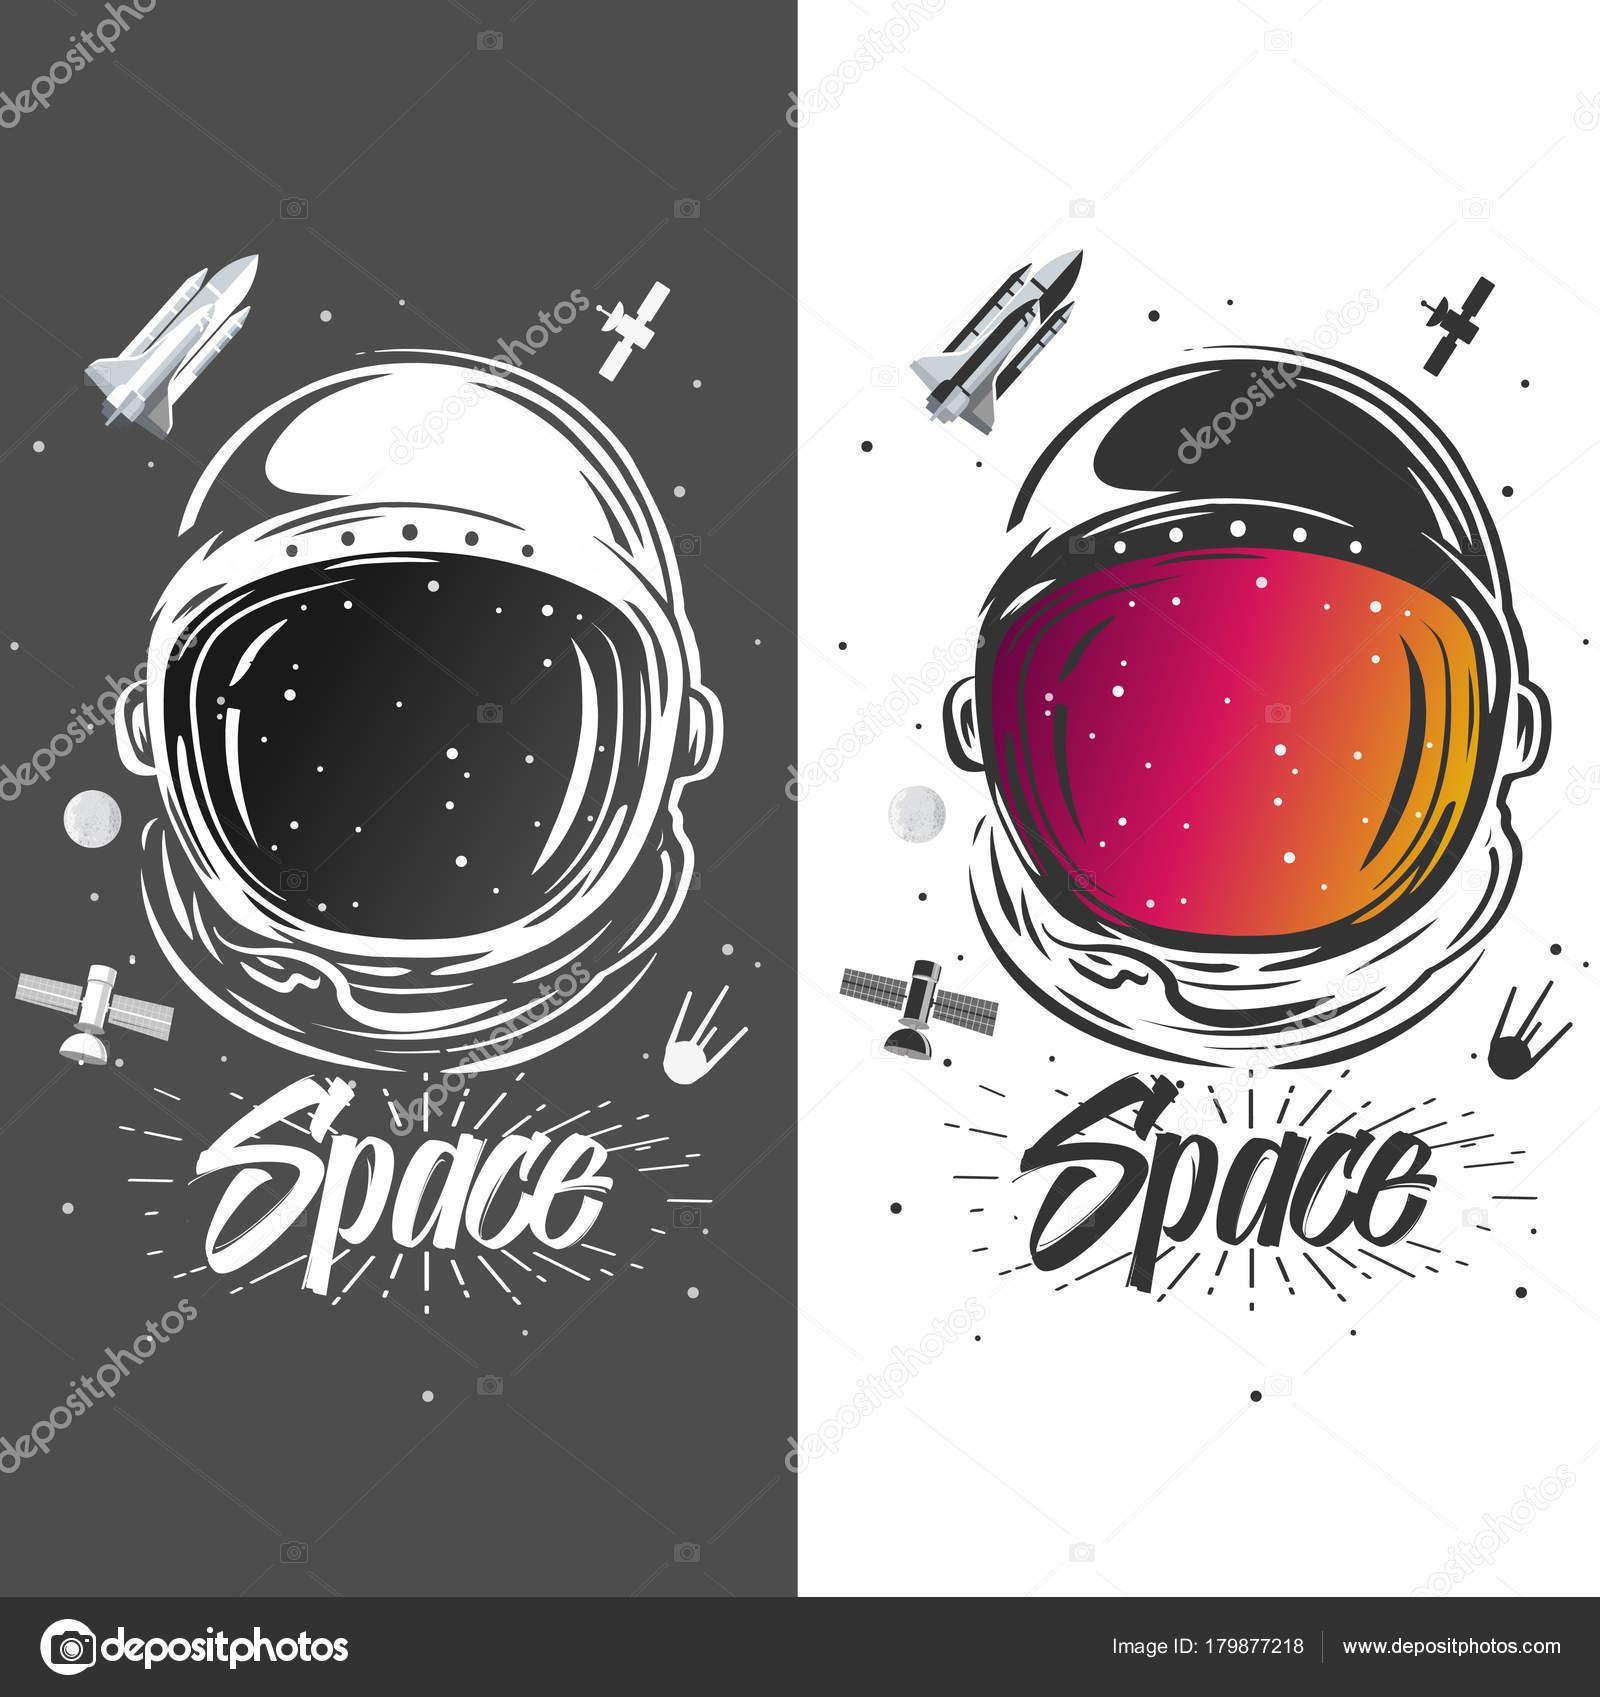 Astronaut suit art space illustration symbol space travel symbol of space travel scientific research astronaut t shirt design spaceman exploring new planets vector by kisarisa biocorpaavc Images